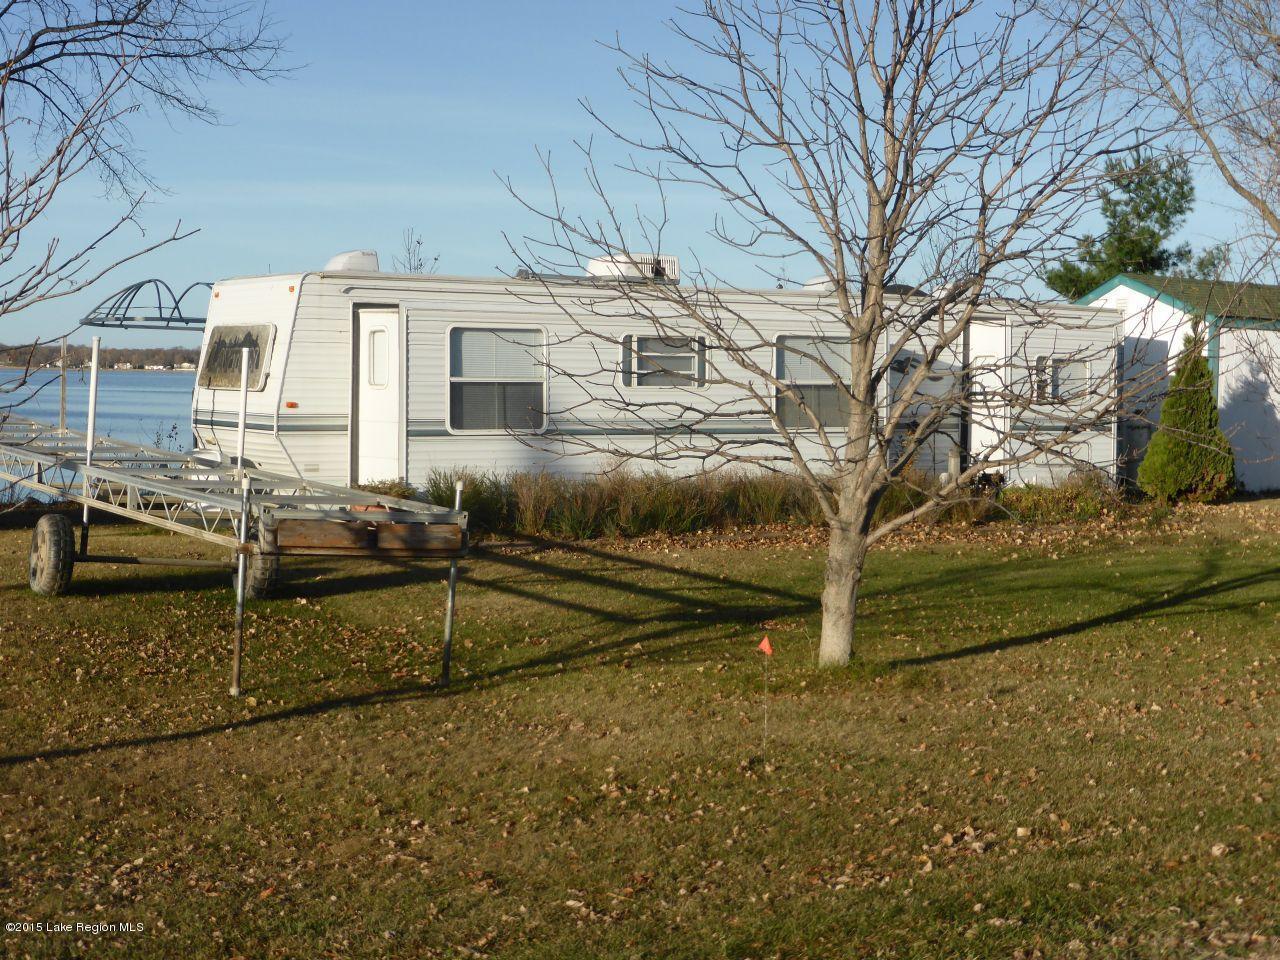 41853 Ukkelberg Dr, Clitherall, Minnesota 56524